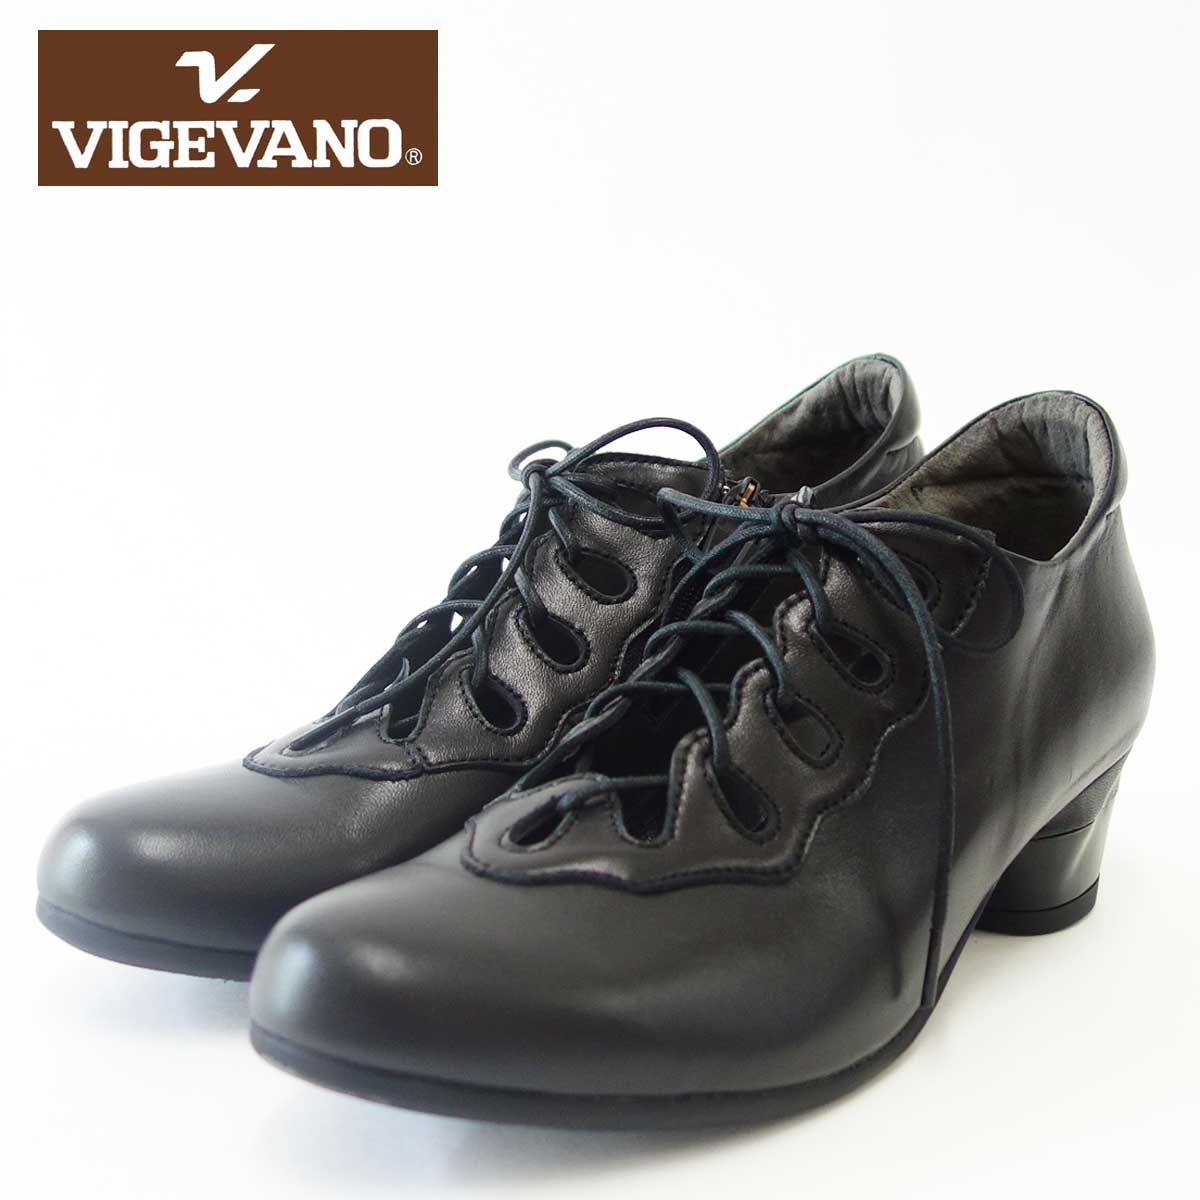 VIGEVANO ビジェバノ 7555 ブラック(日本製)ゆったり4E レースアップシューズ上質な天然皮革が優しく包み込みます「靴」